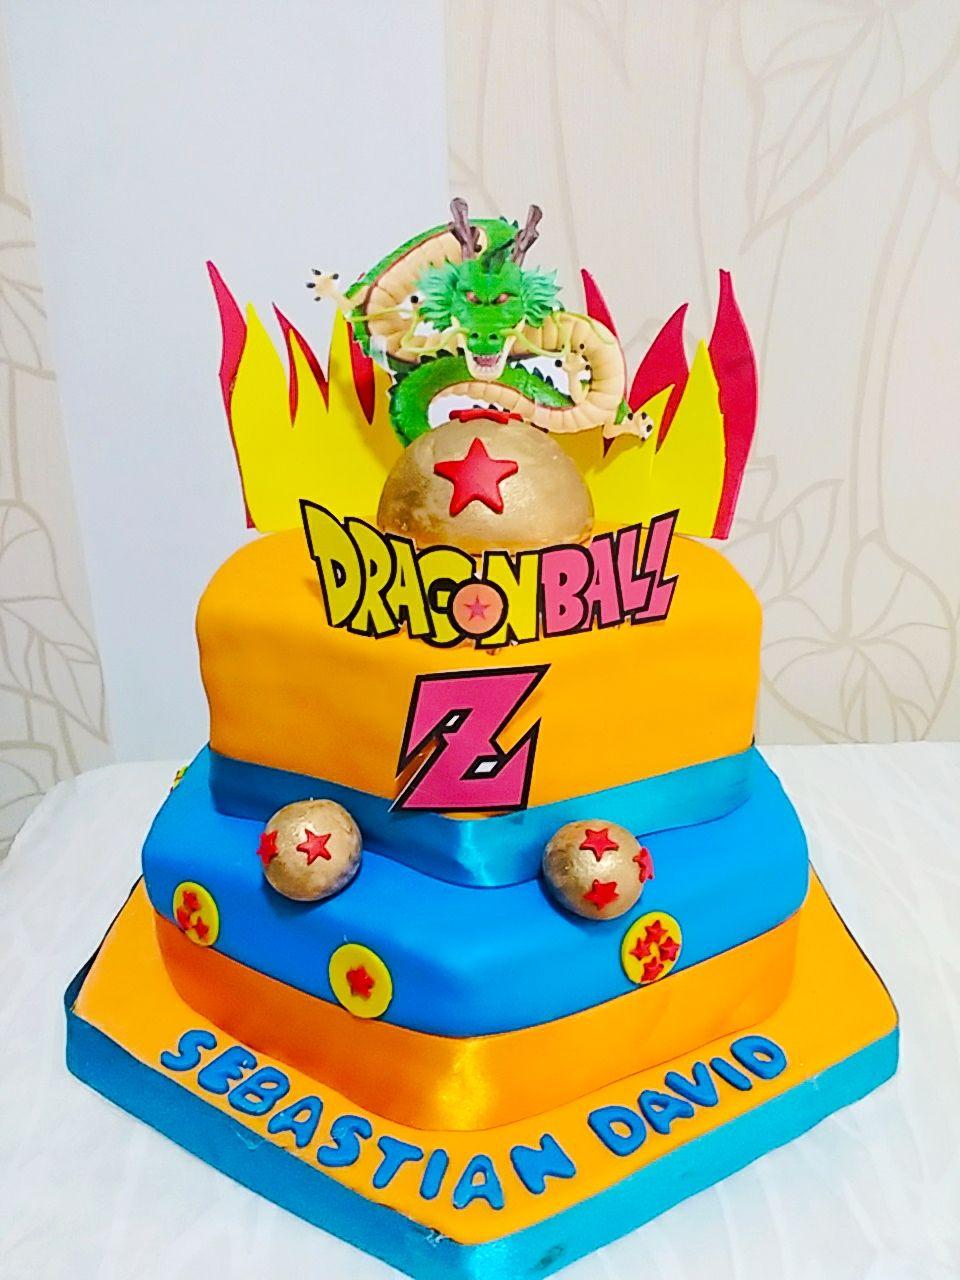 Dragon Ball Z Cake Decorations Cake Torta Dragon Ball  Ideias  Pinterest  Dragon Ball And Cake